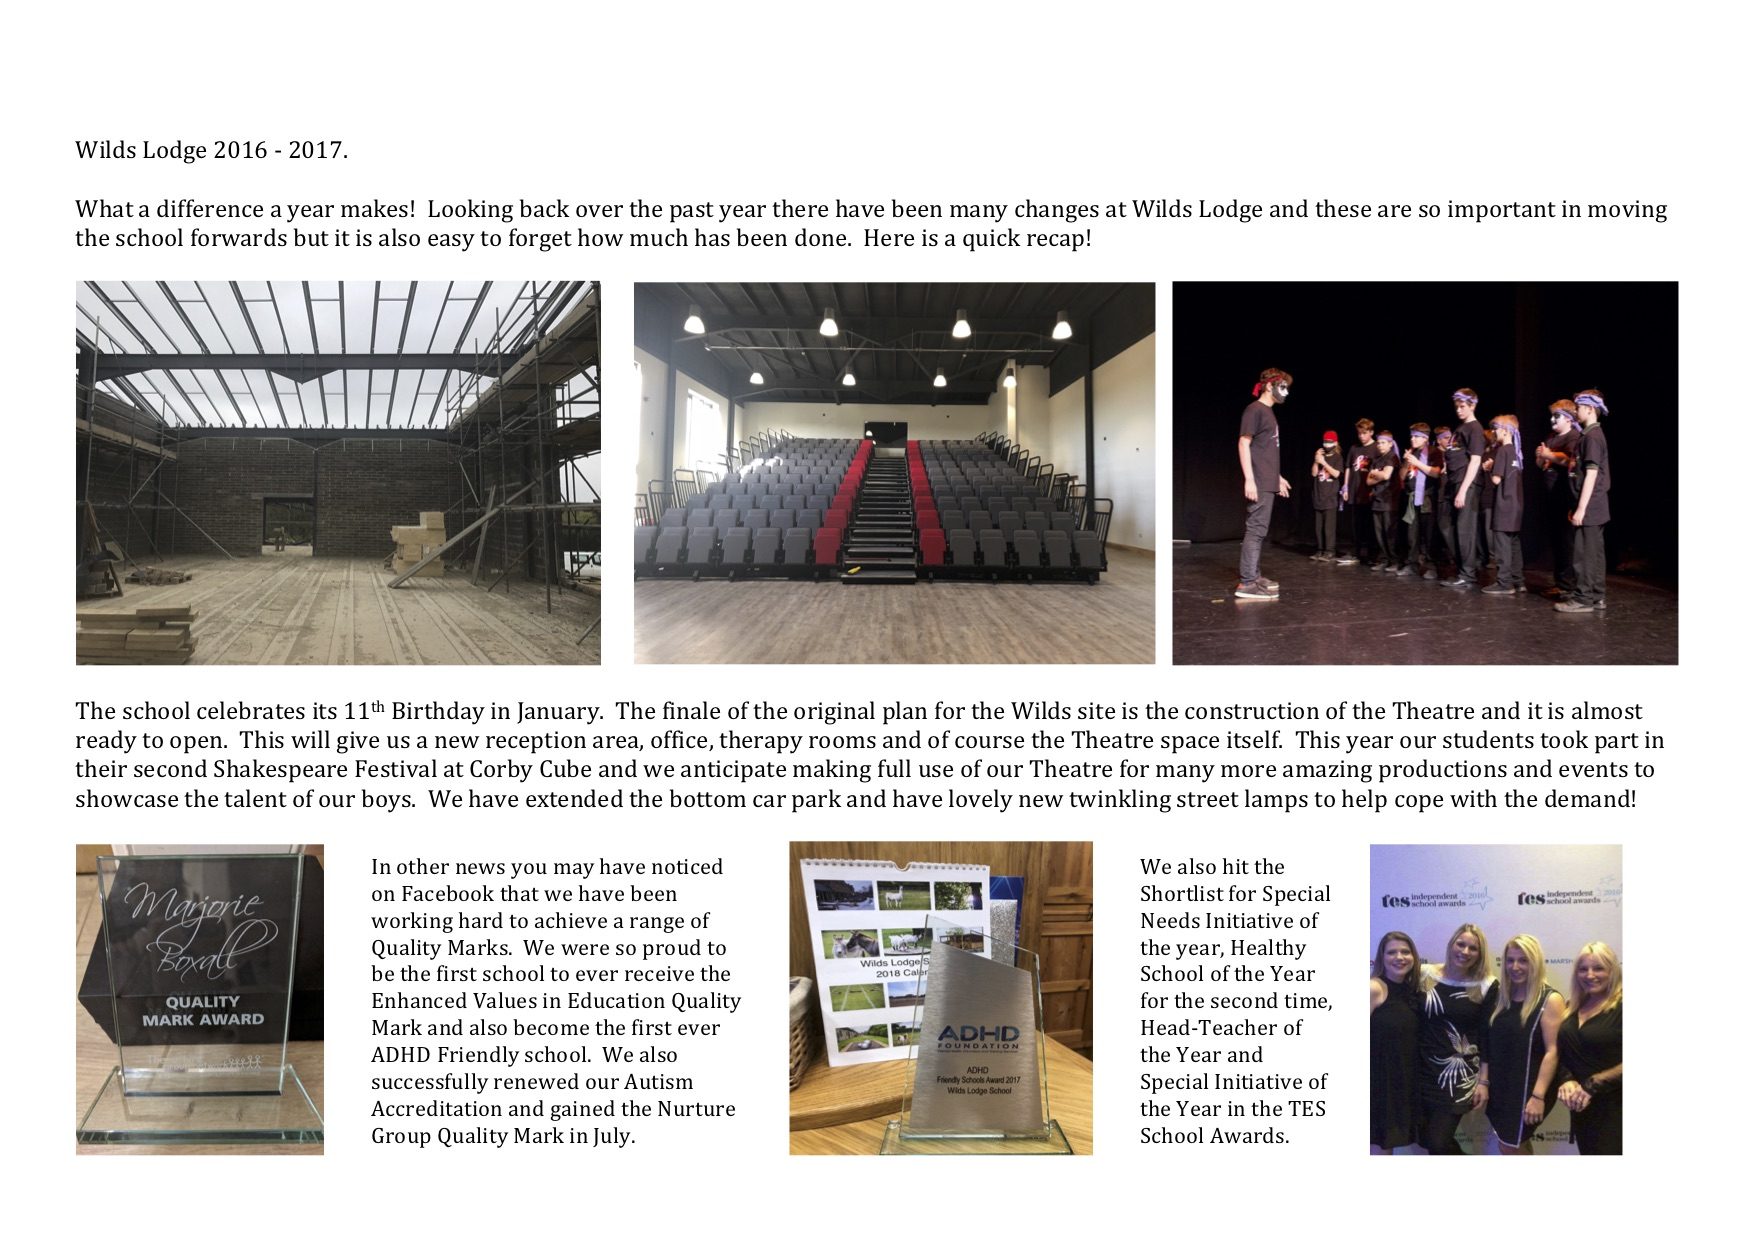 Wilds Lodge 2016-17 update1.jpg